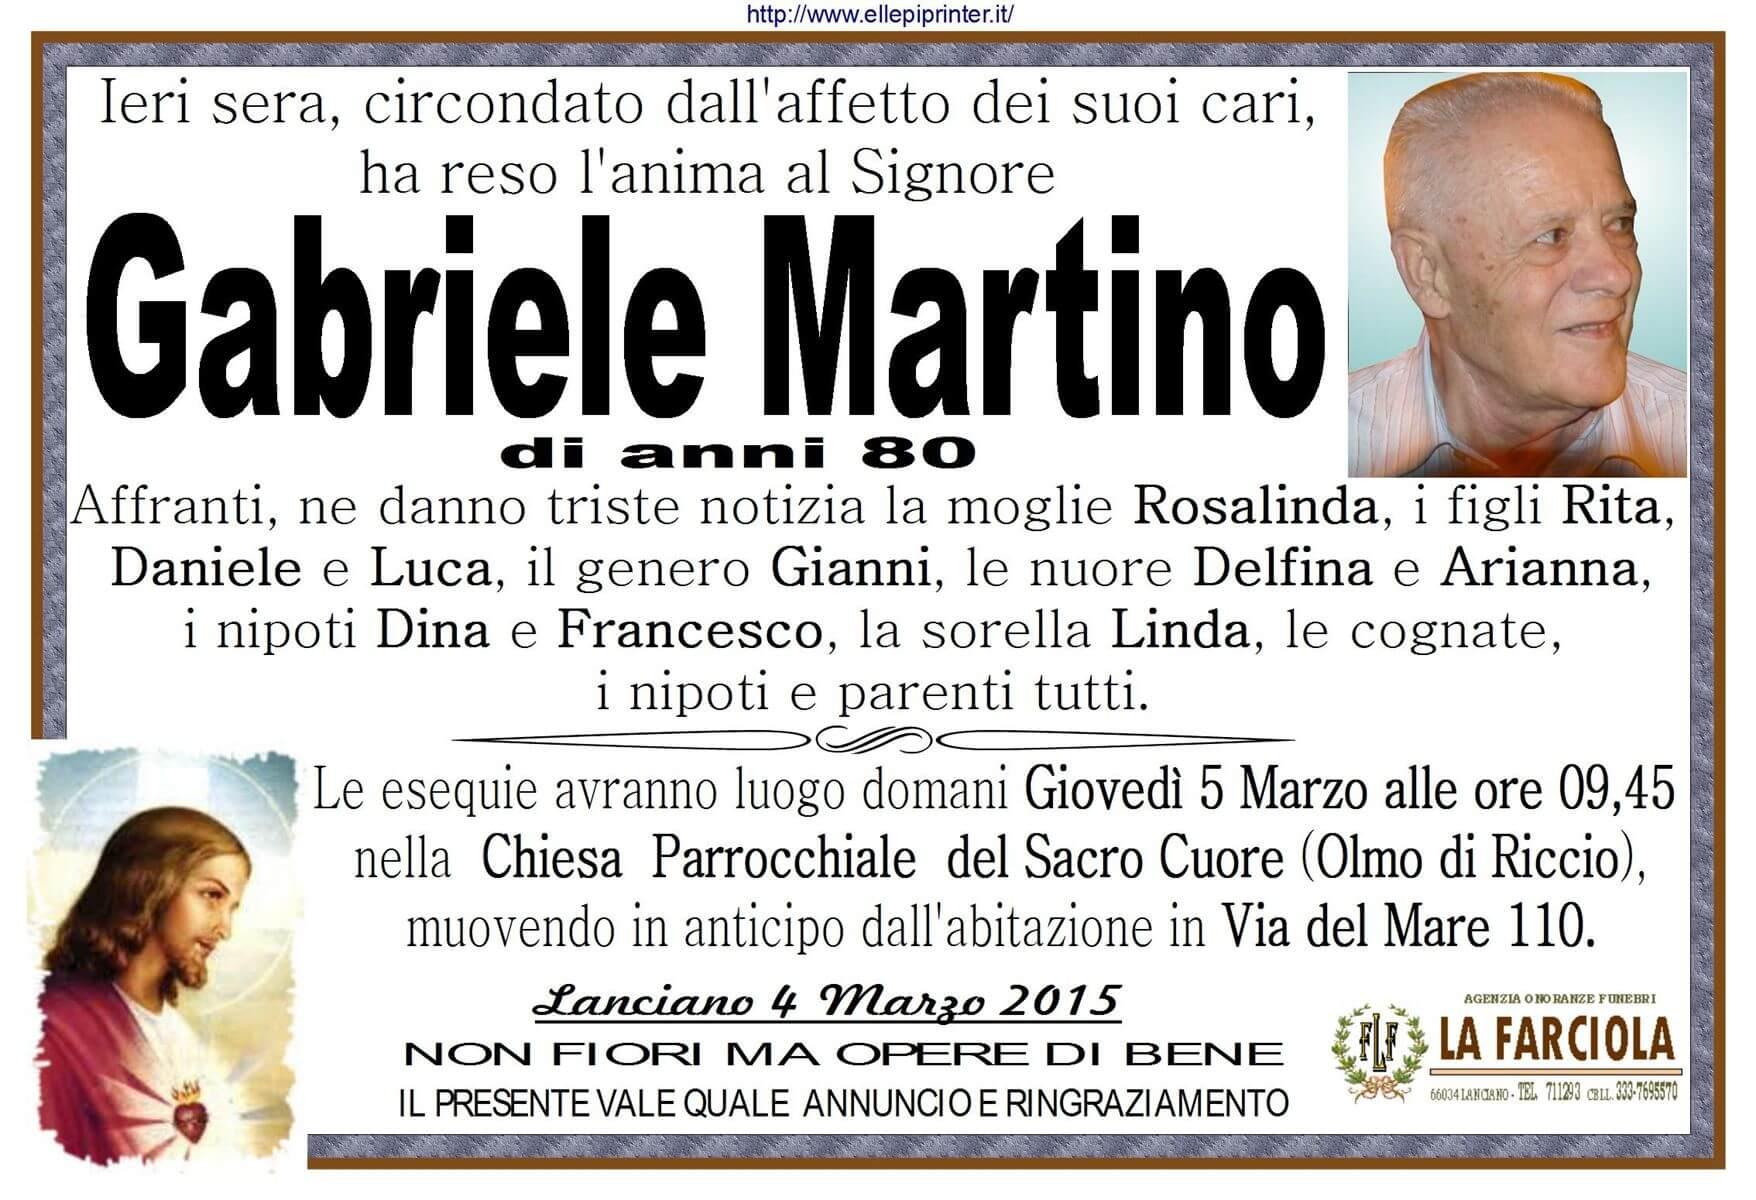 MANIFESTO MARTINO GABRIELE